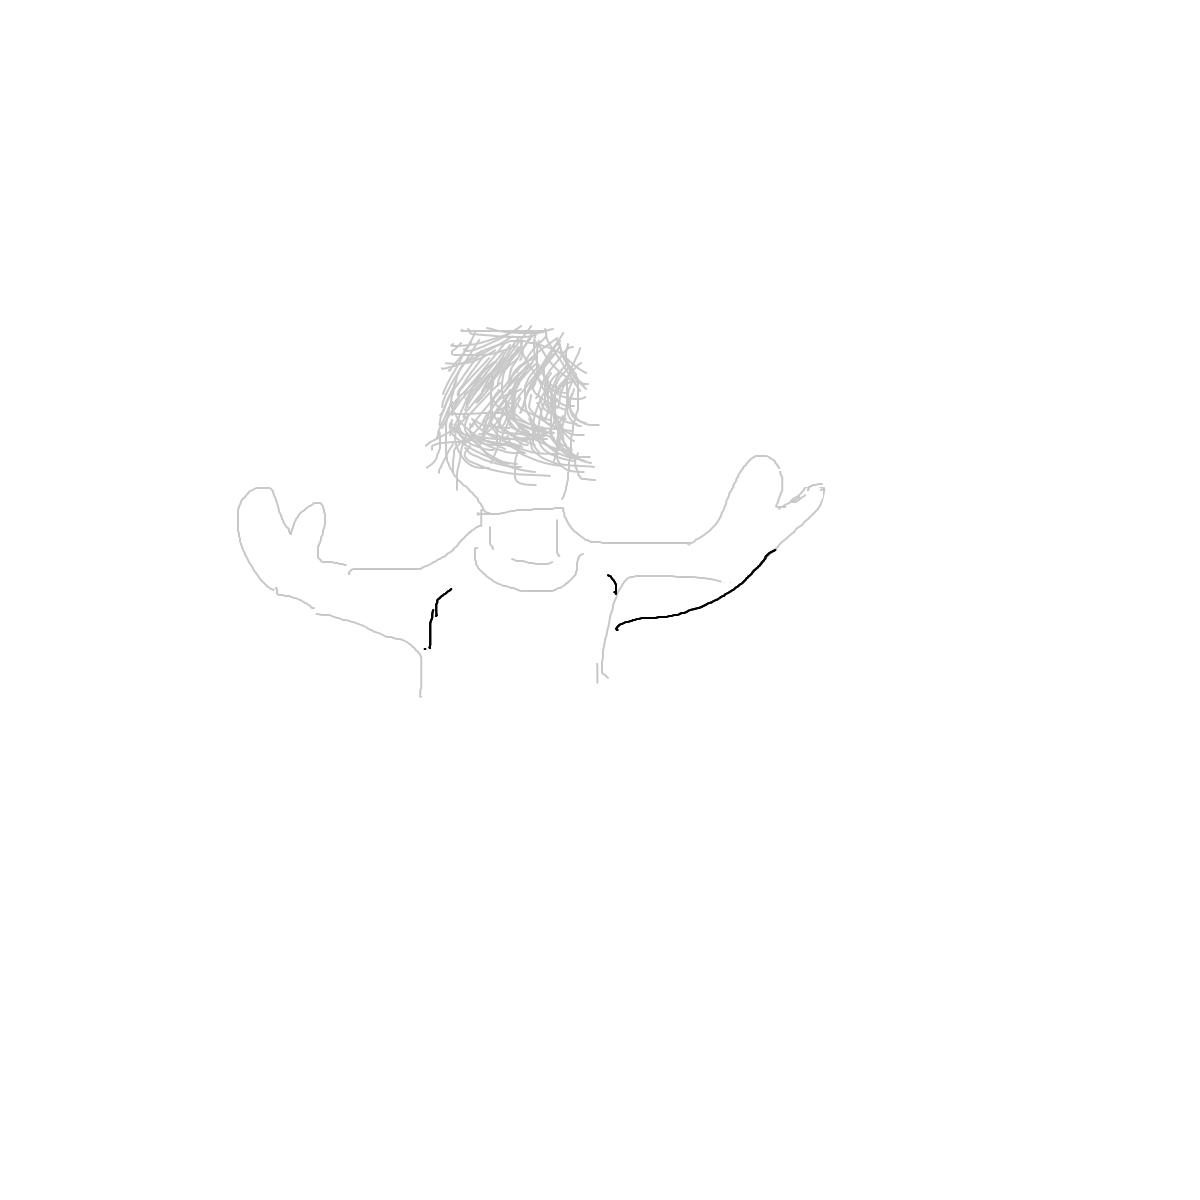 BAAAM drawing#5262 lat:39.9655952453613300lng: -75.1809082031250000